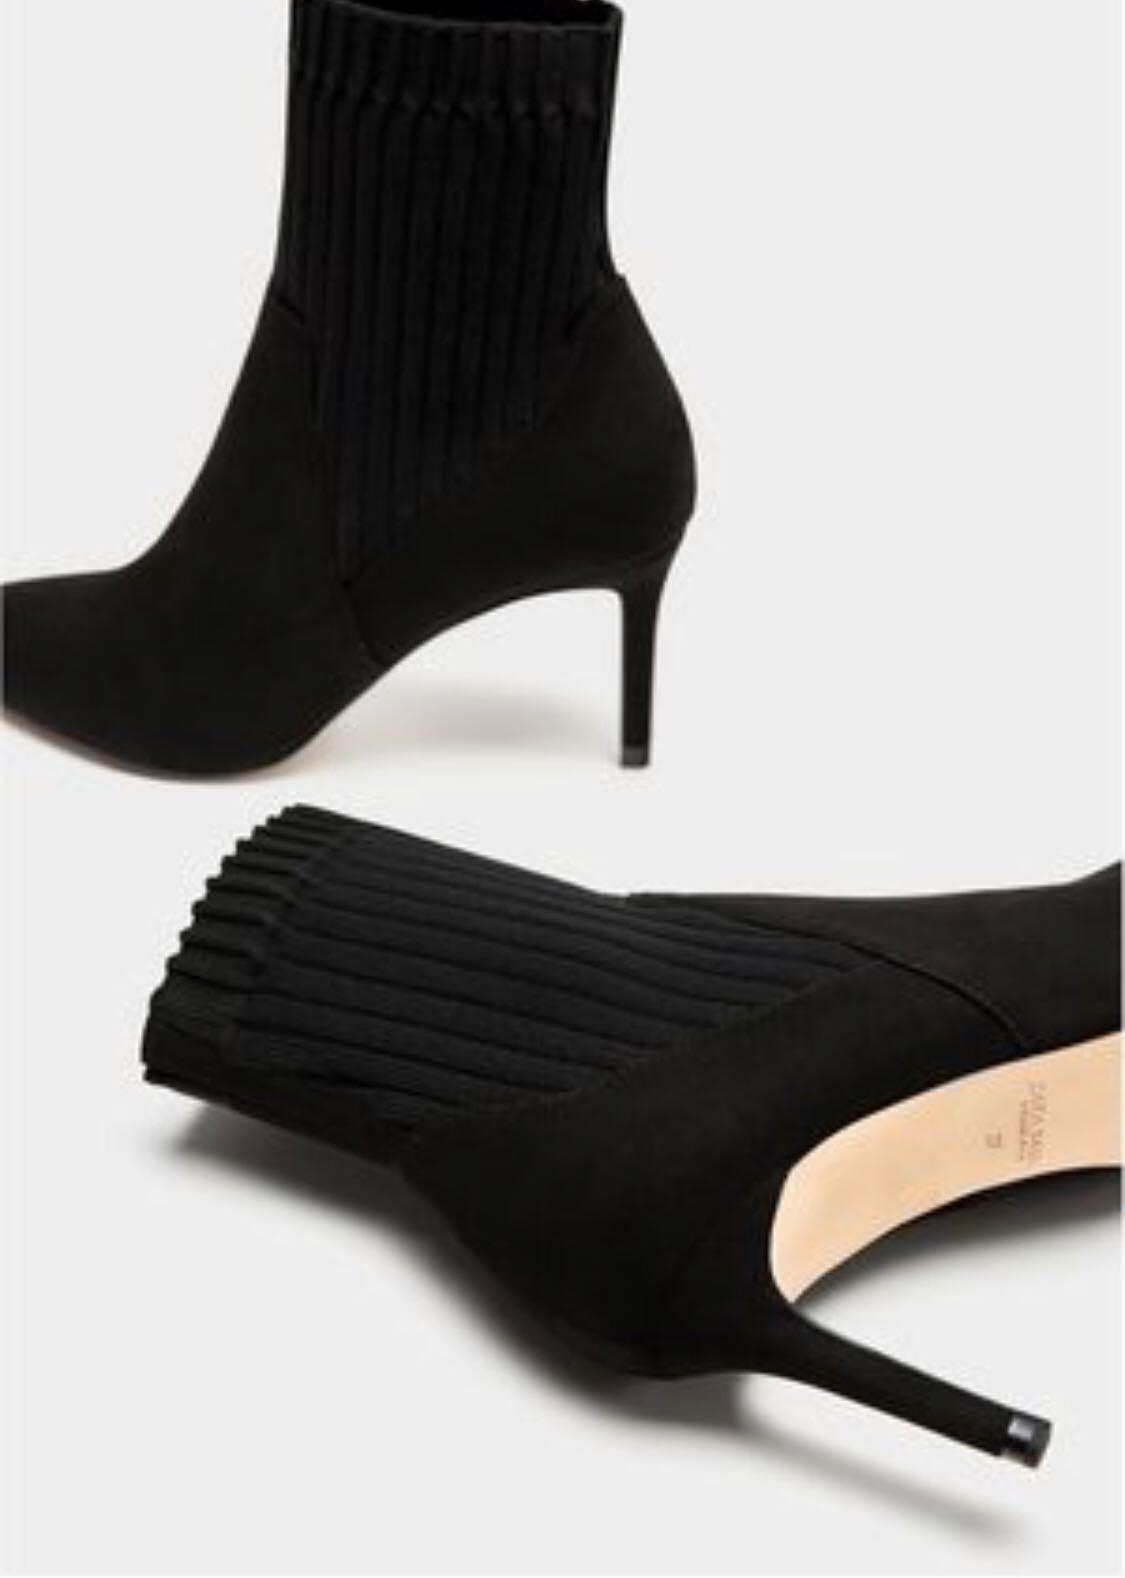 botines calcetín zara carolina personal shopper rebajas